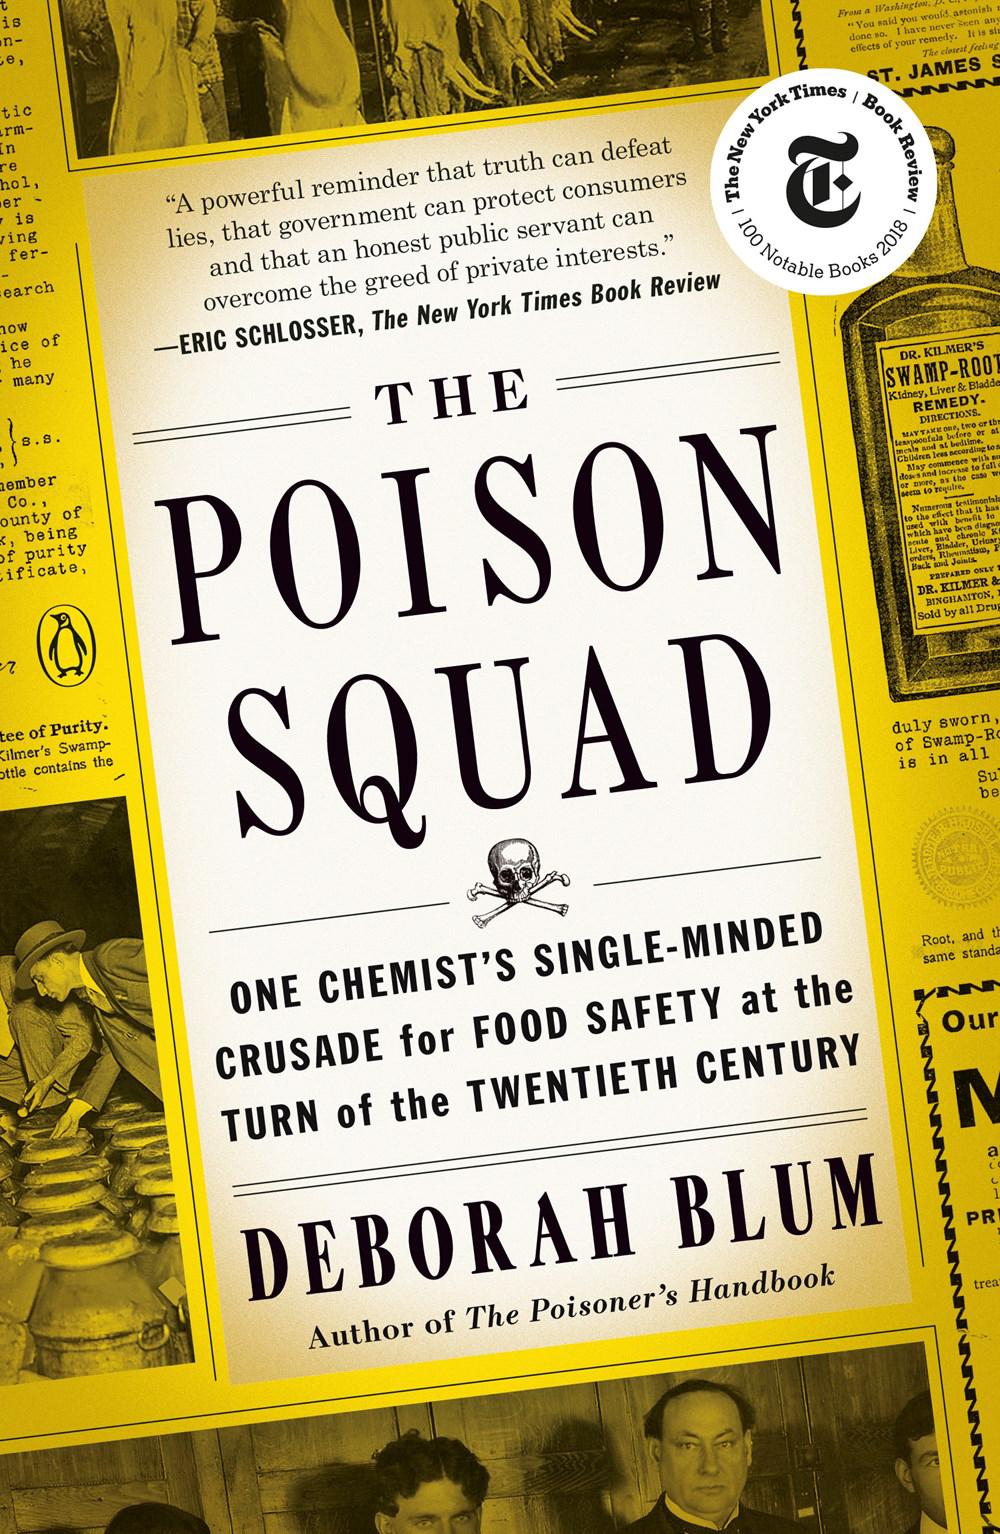 Poison Squad by Deborah Blum